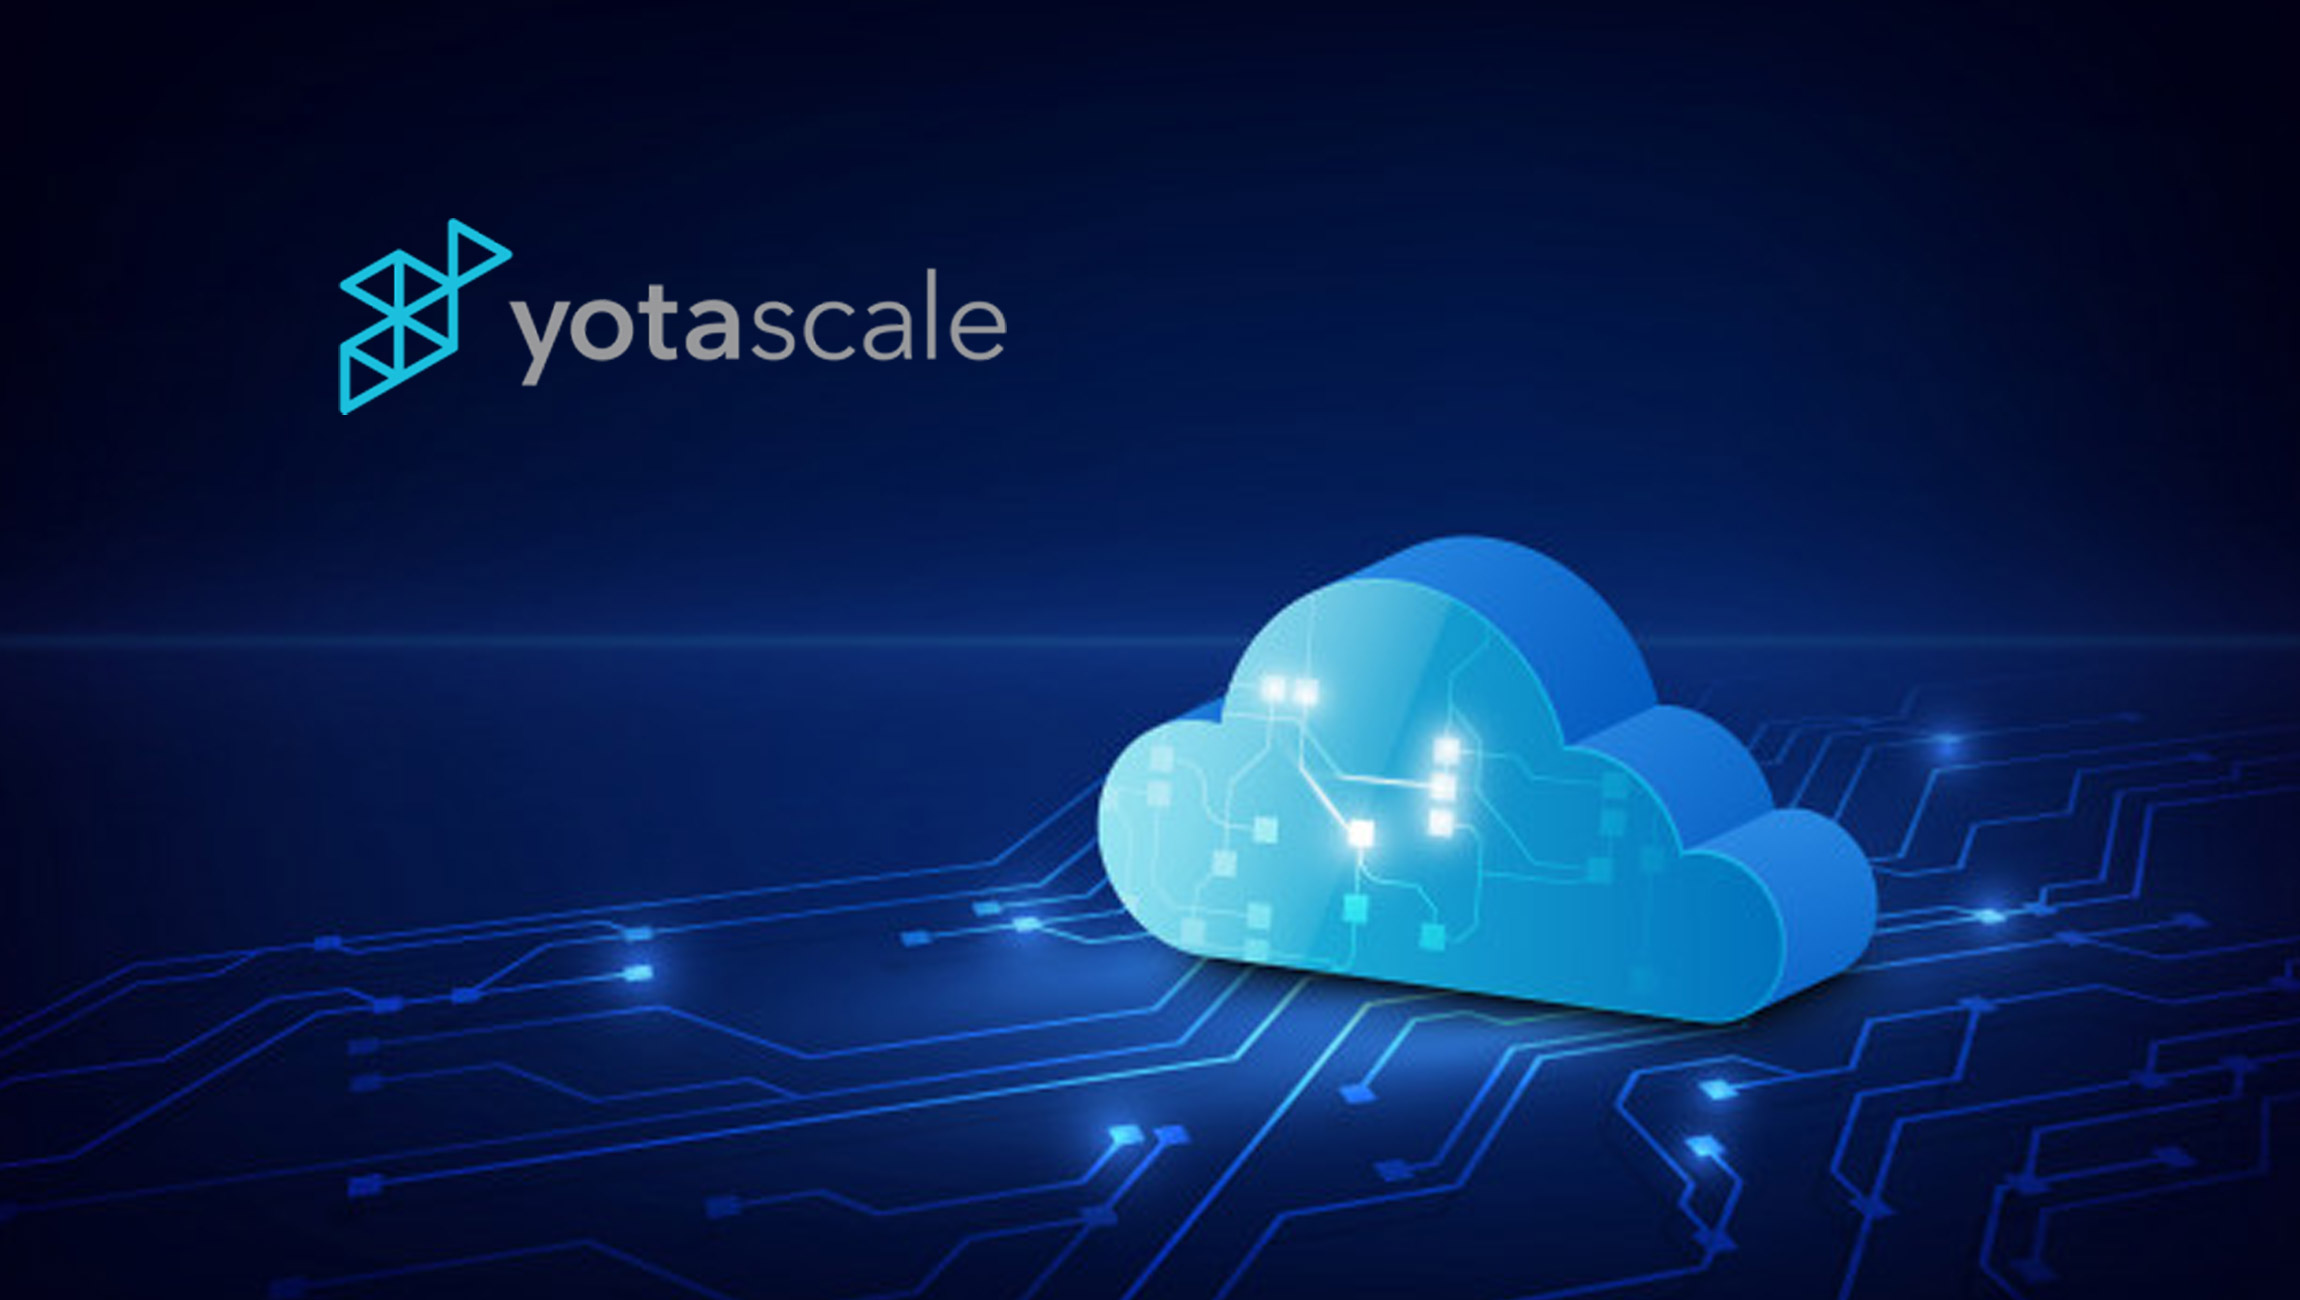 Yotascale Named a 2021 Gartner Cool Vendor in Cloud Computing